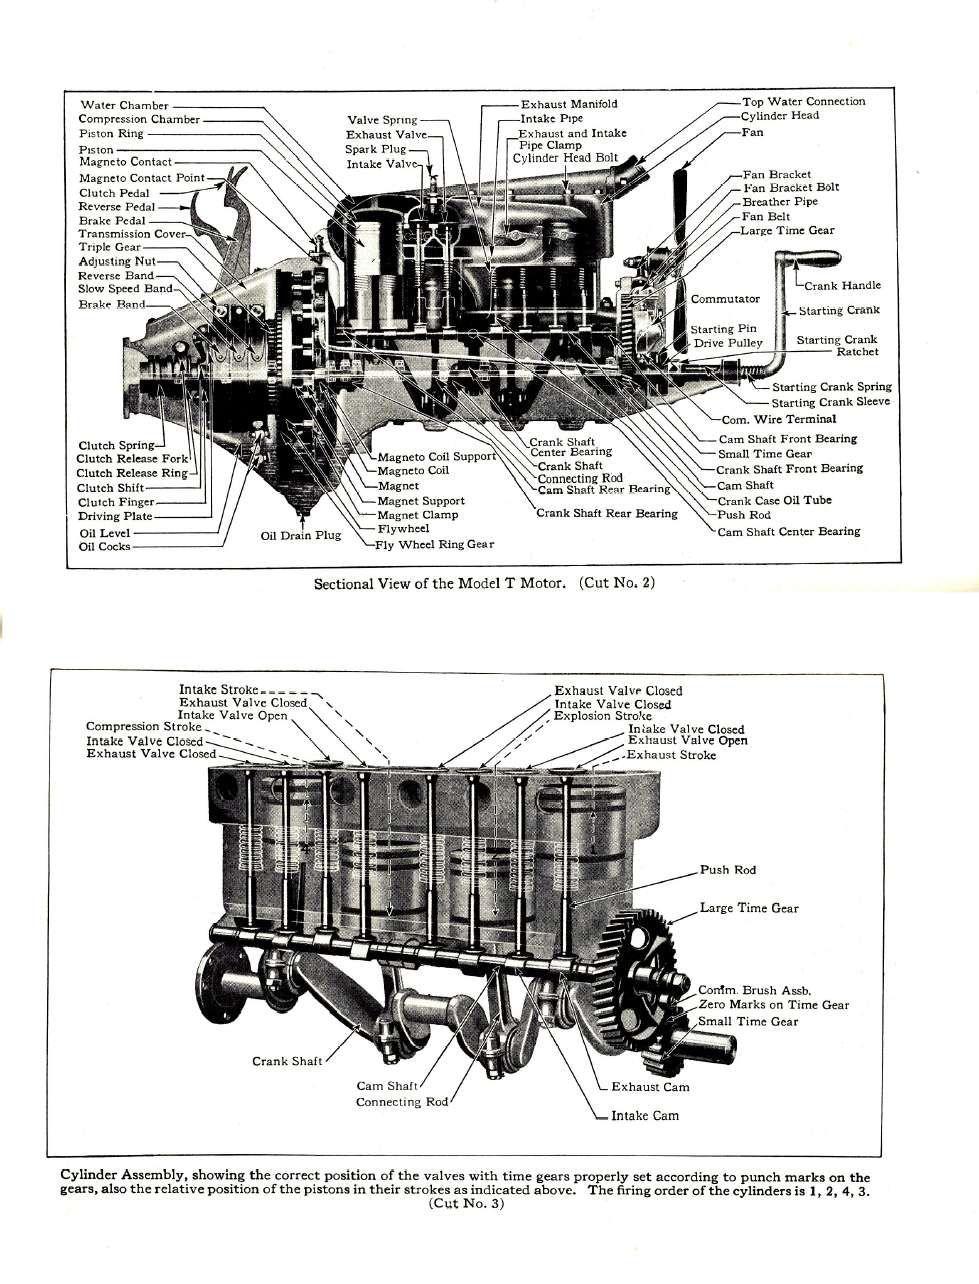 1924 Ford Model T Wiring Diagram Nodes Lymphatic System Wrg 2785